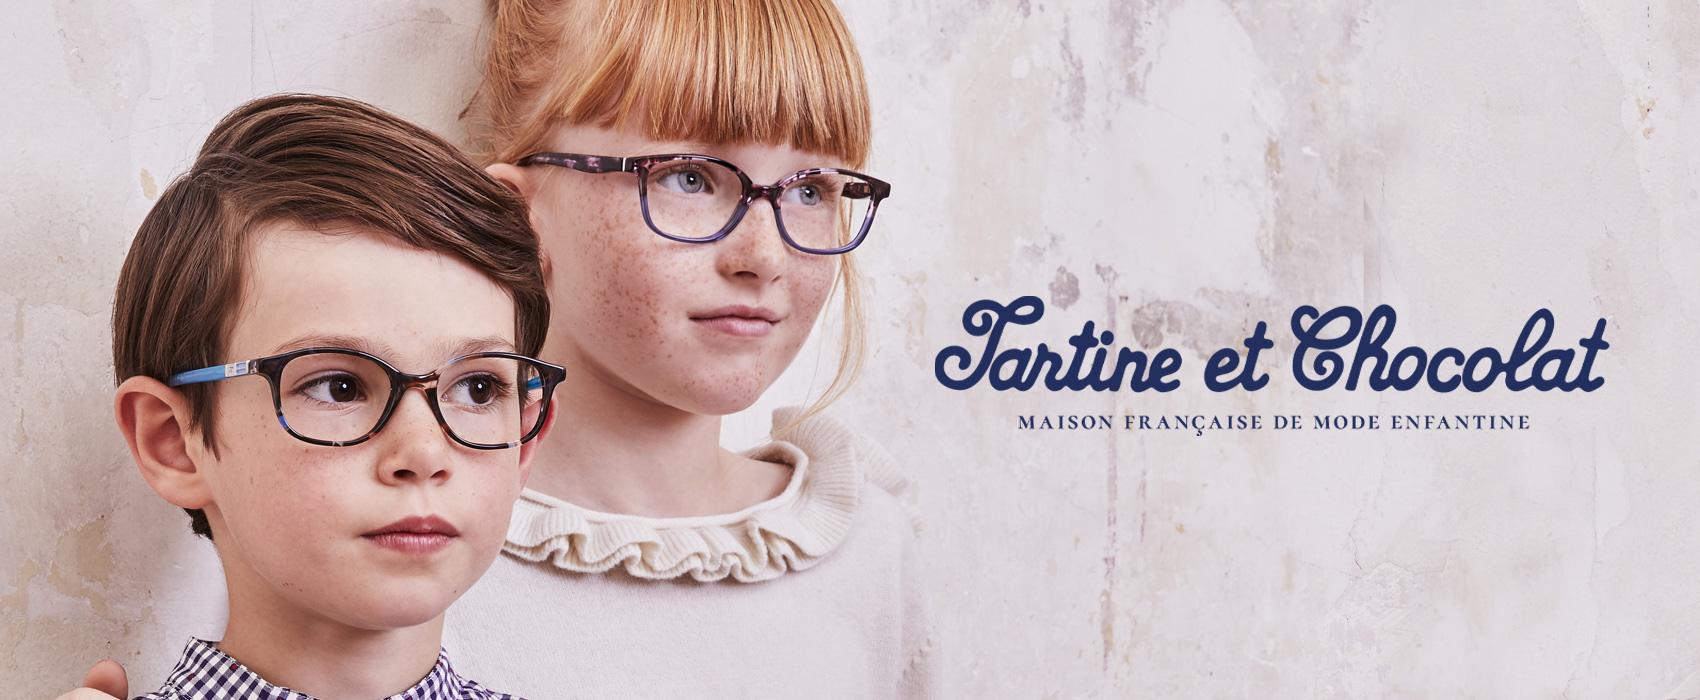 CG2021_Marques_1700x700_Tartine